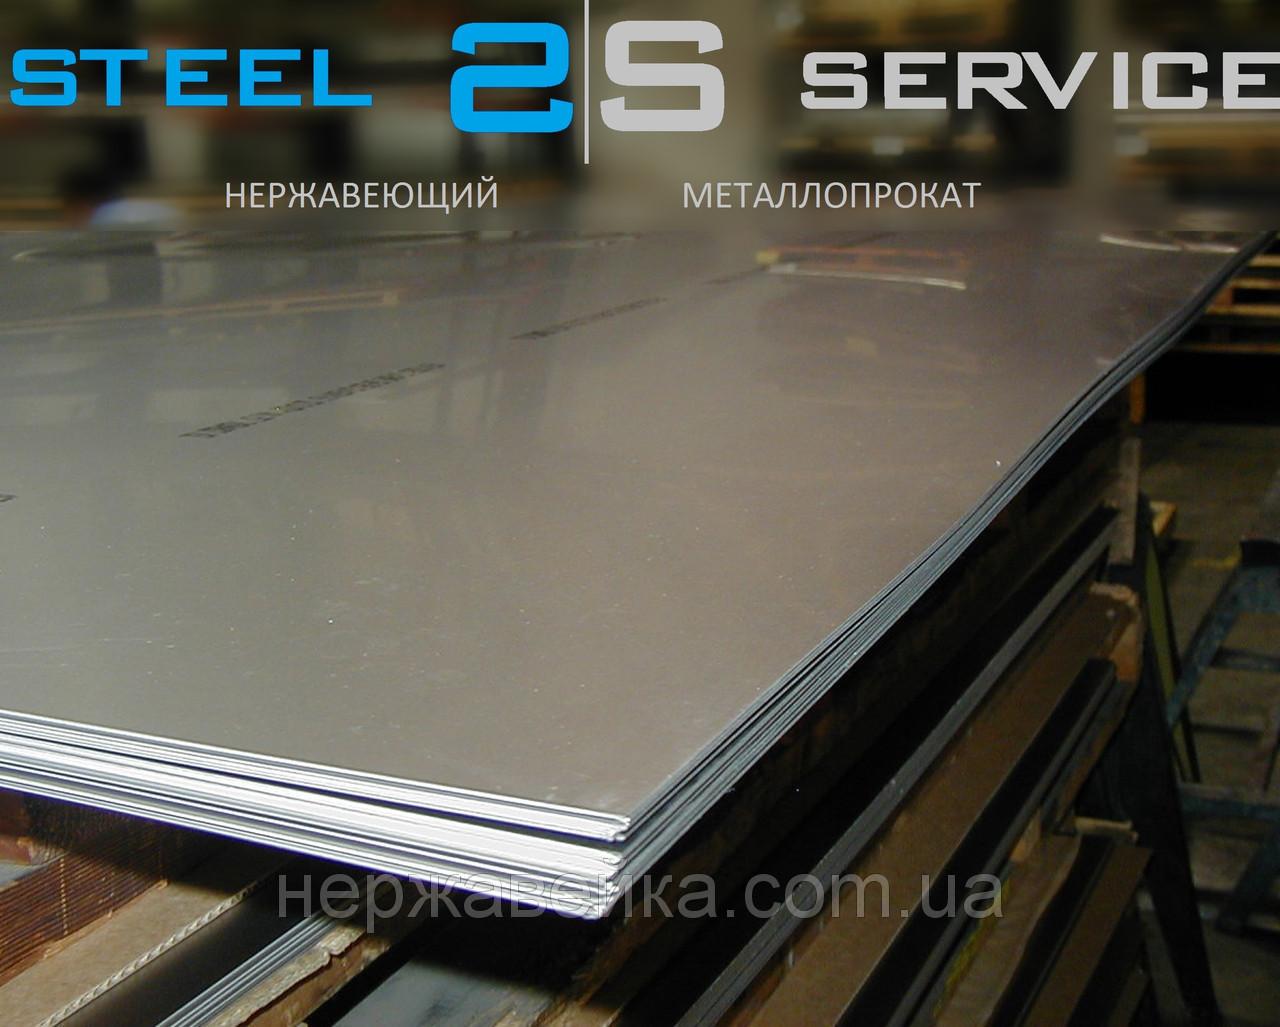 Нержавейка лист 1х1250х2500мм AiSi 202  (12Х17Г9АН4) - 4N - шлифованный